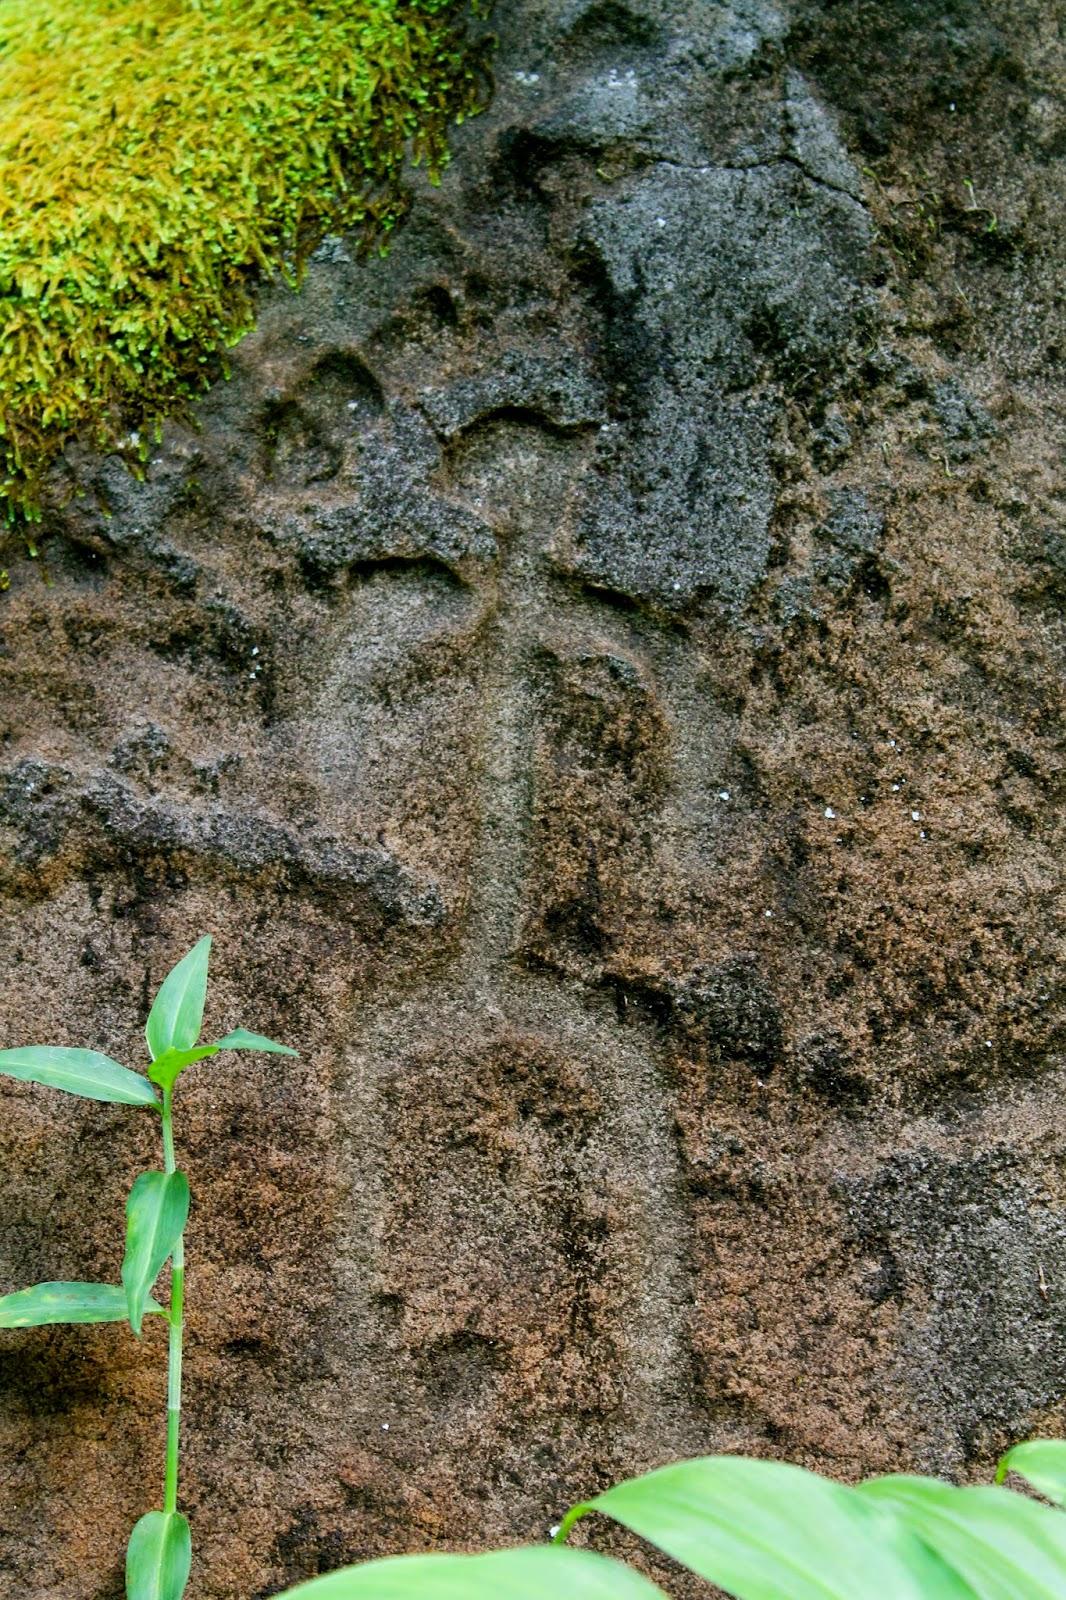 Justin D. Kondrat : National Tropical Botanical garden week 5